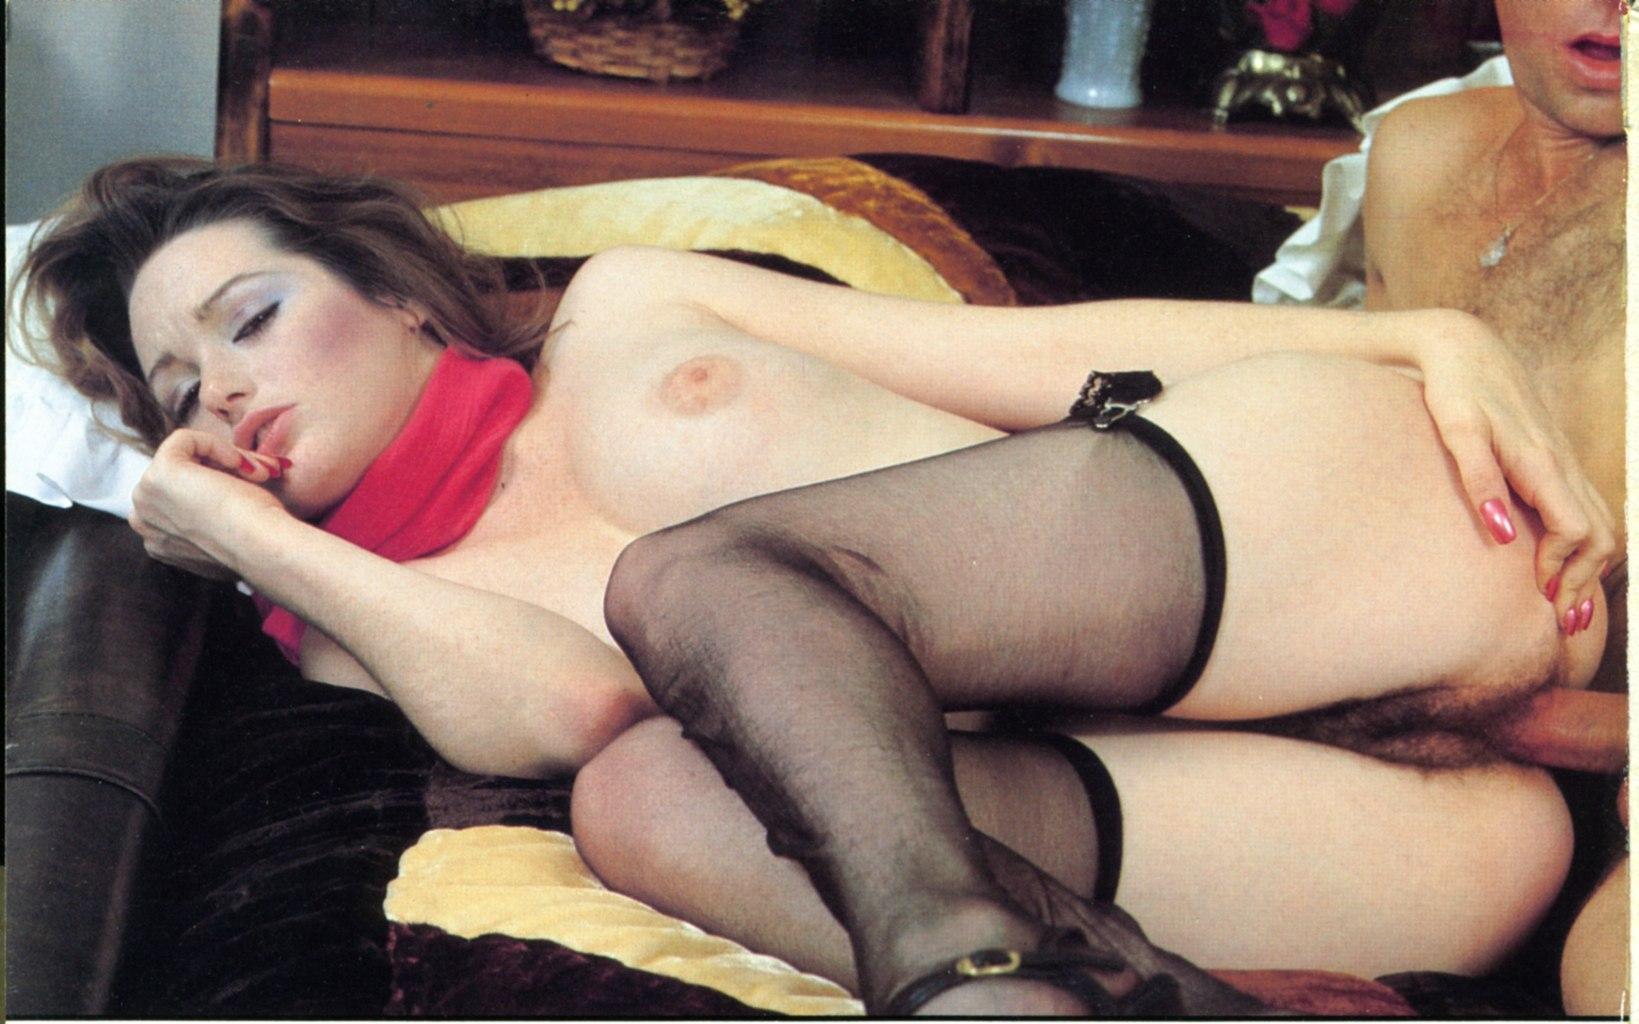 jacqueline porn star